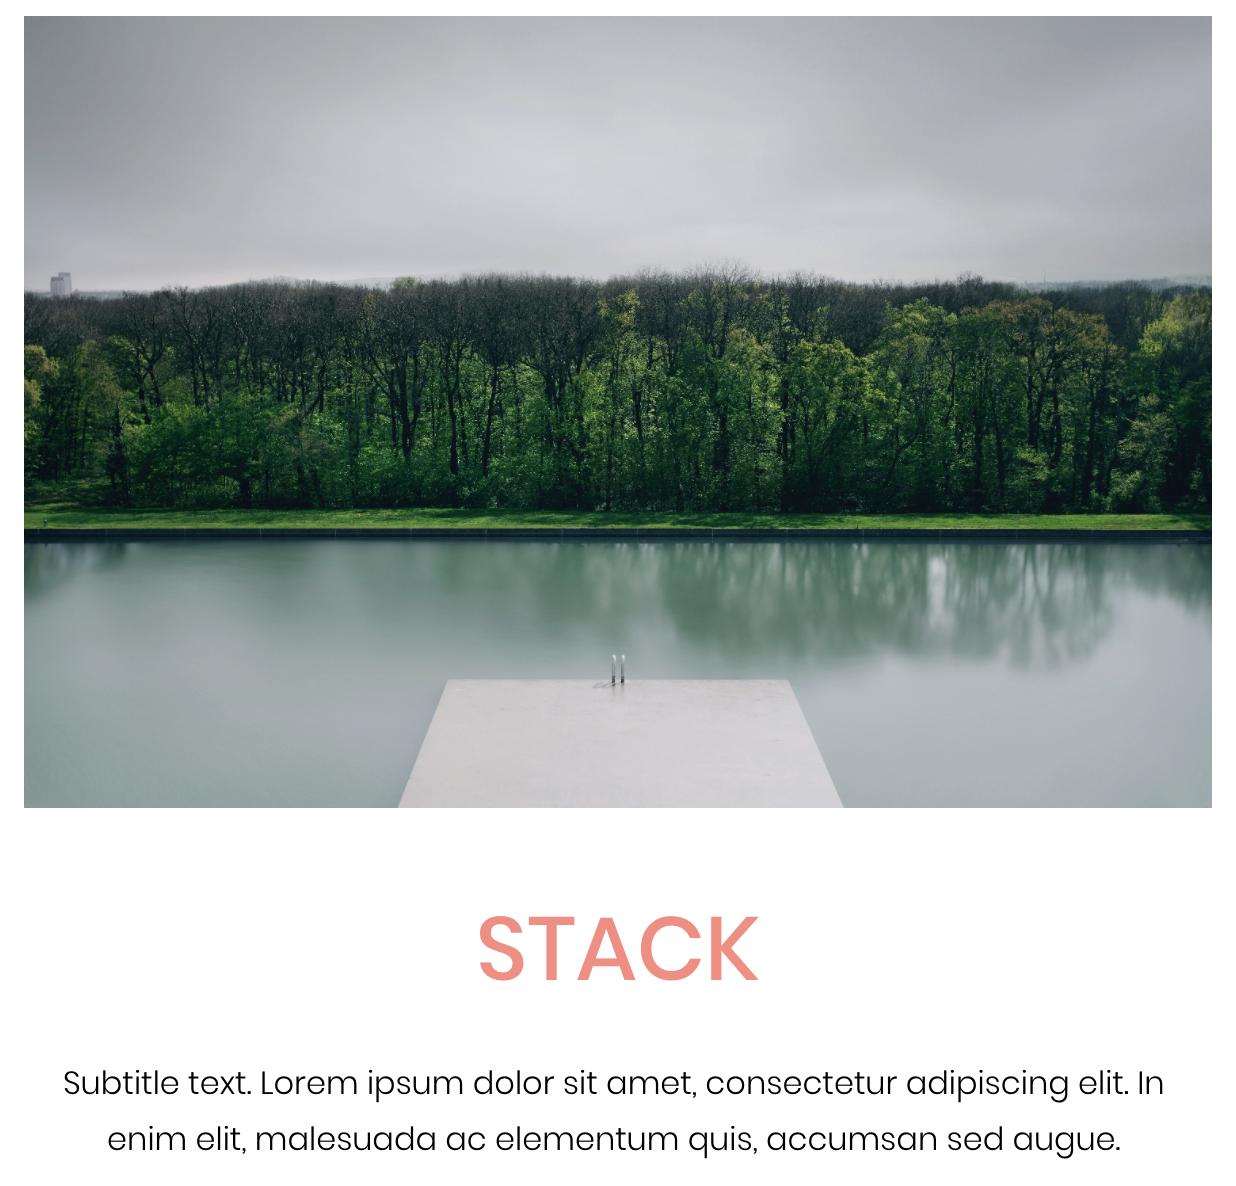 Stack_image_block.png